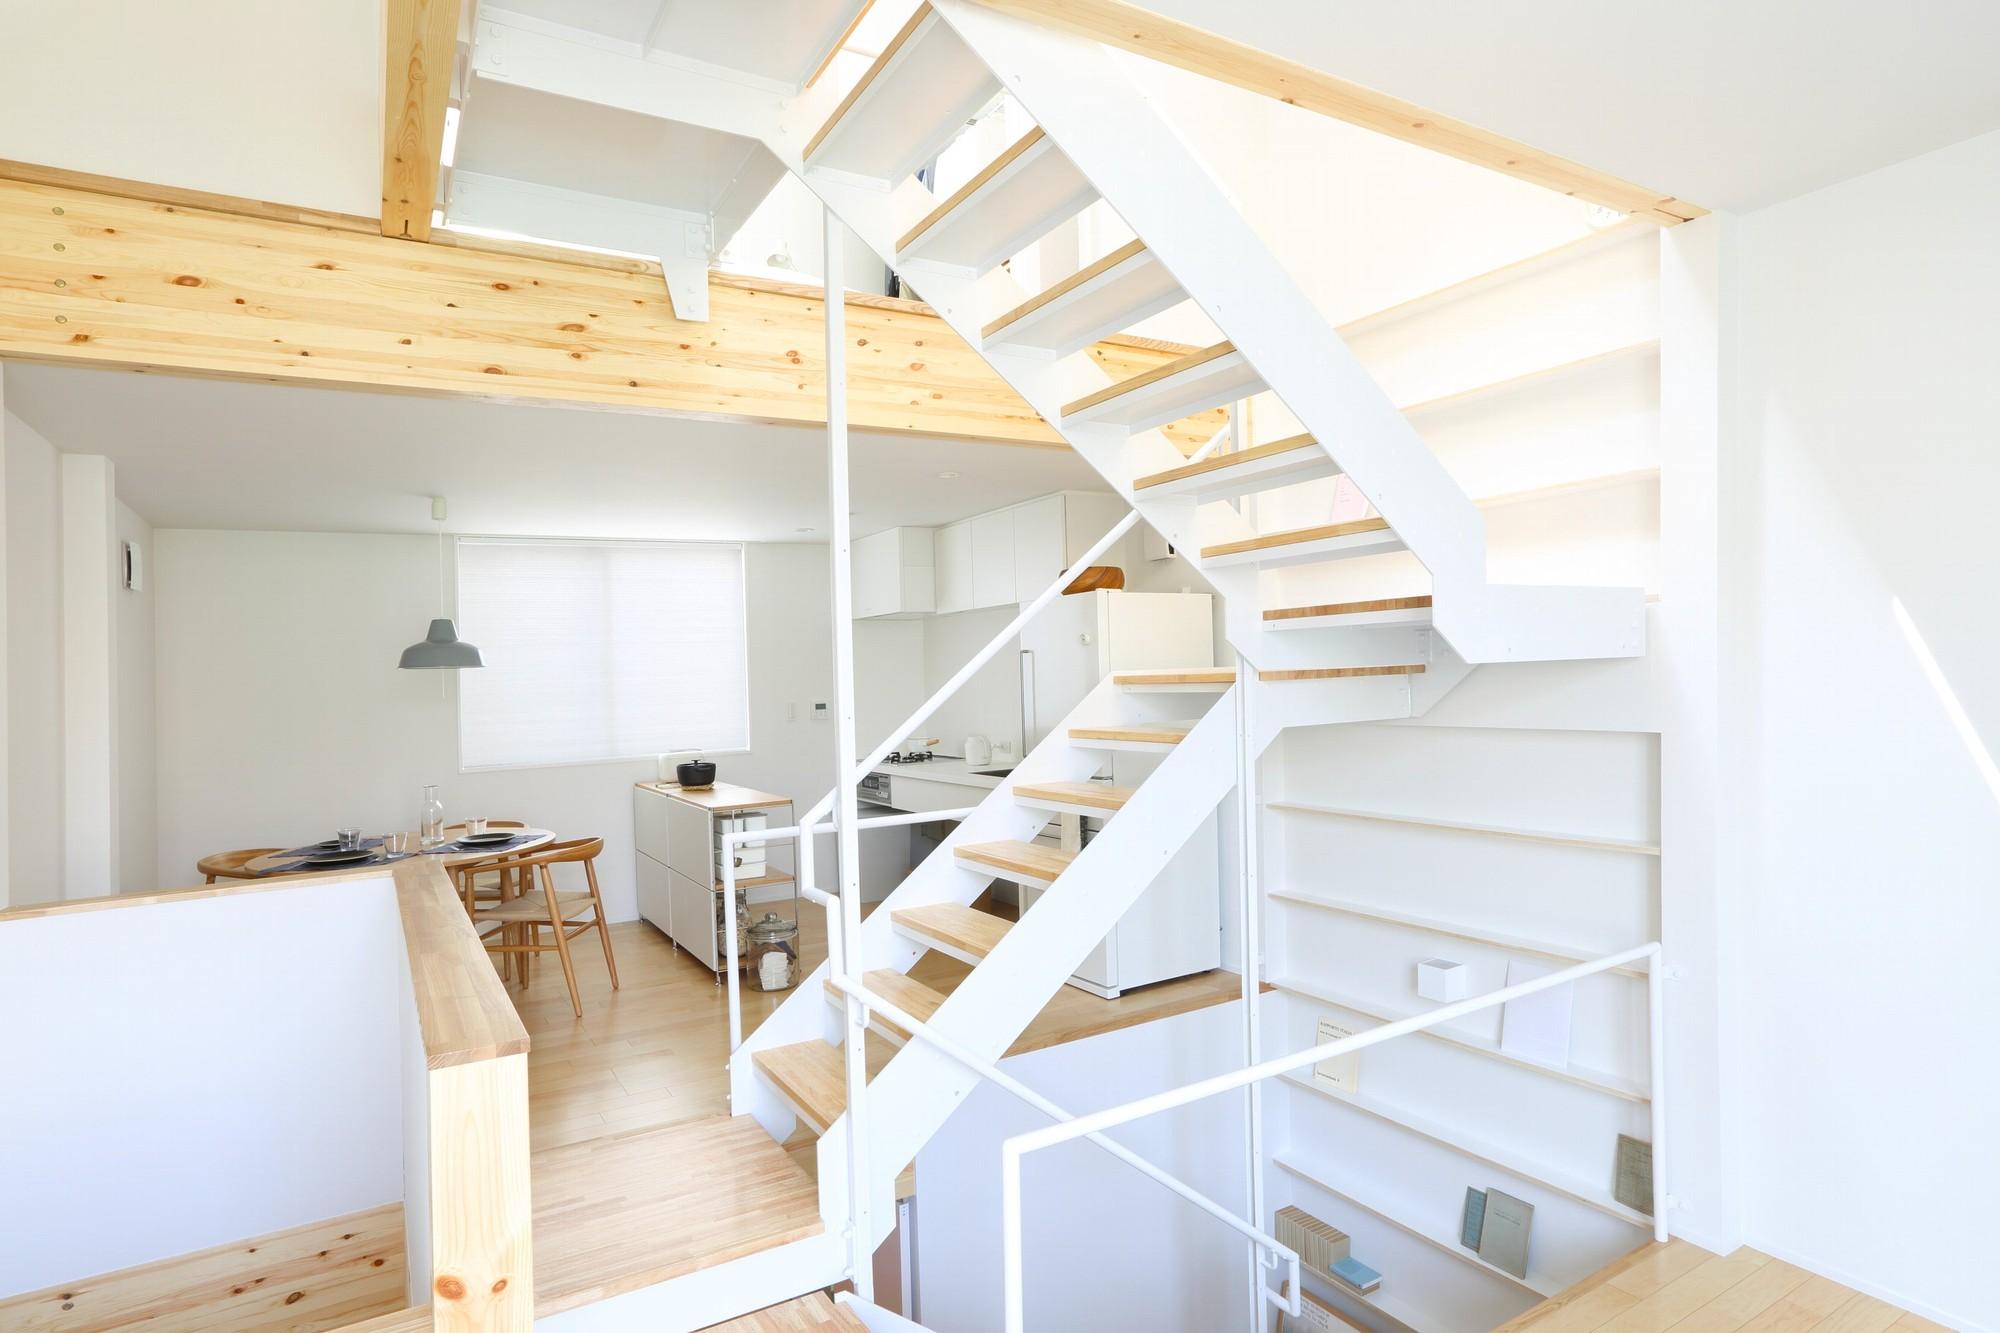 Design You Own Home Best Kitchen Gallery | Rachelxblog design your ...